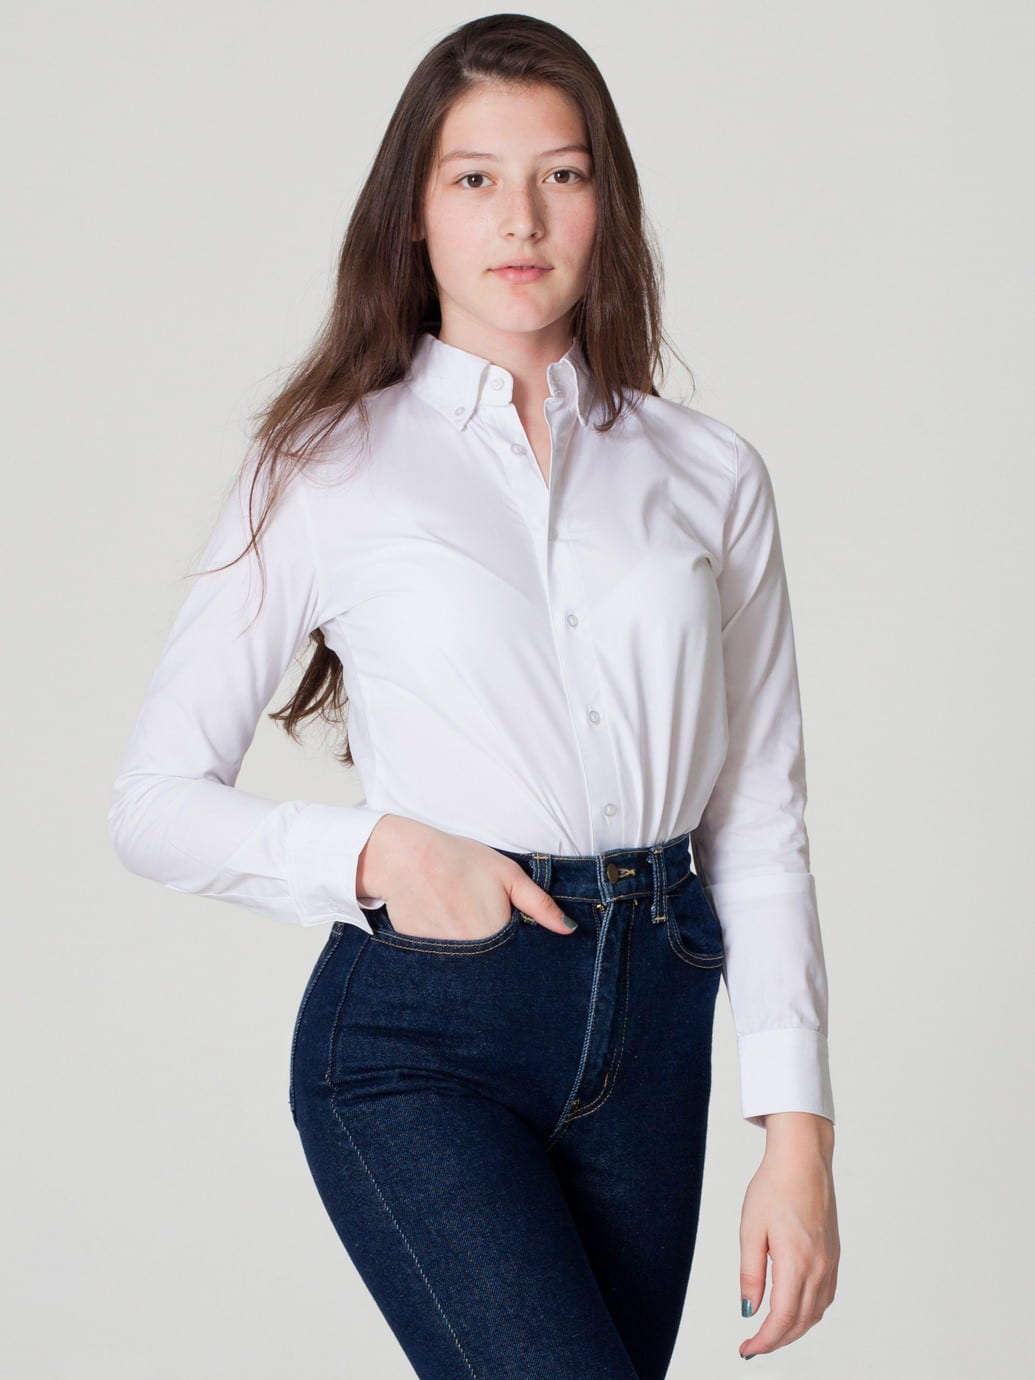 Style A Basic White Shirt